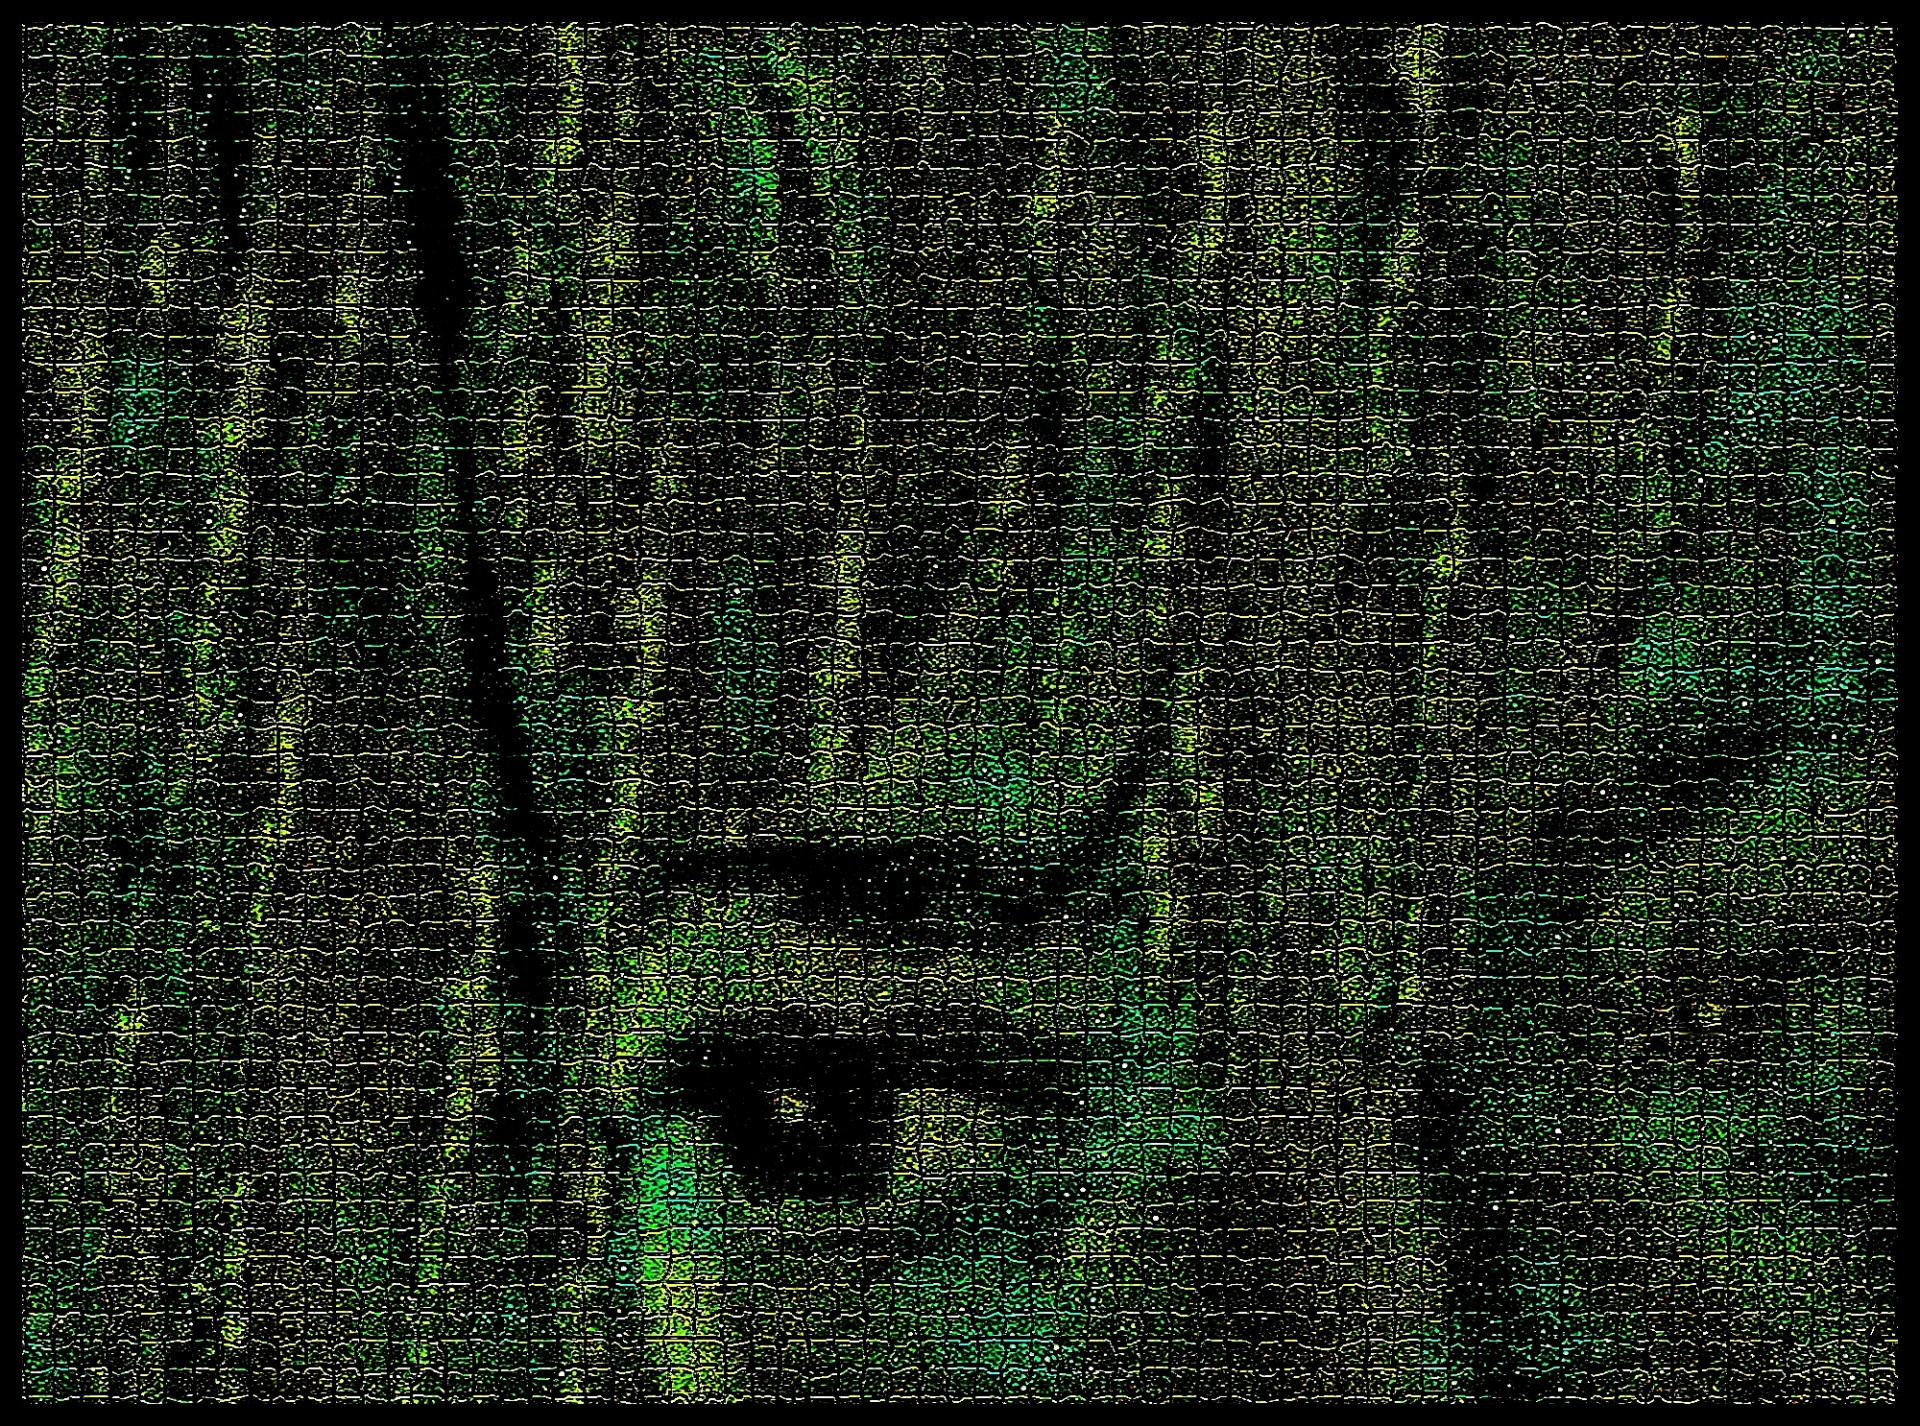 ojo en fondo verde